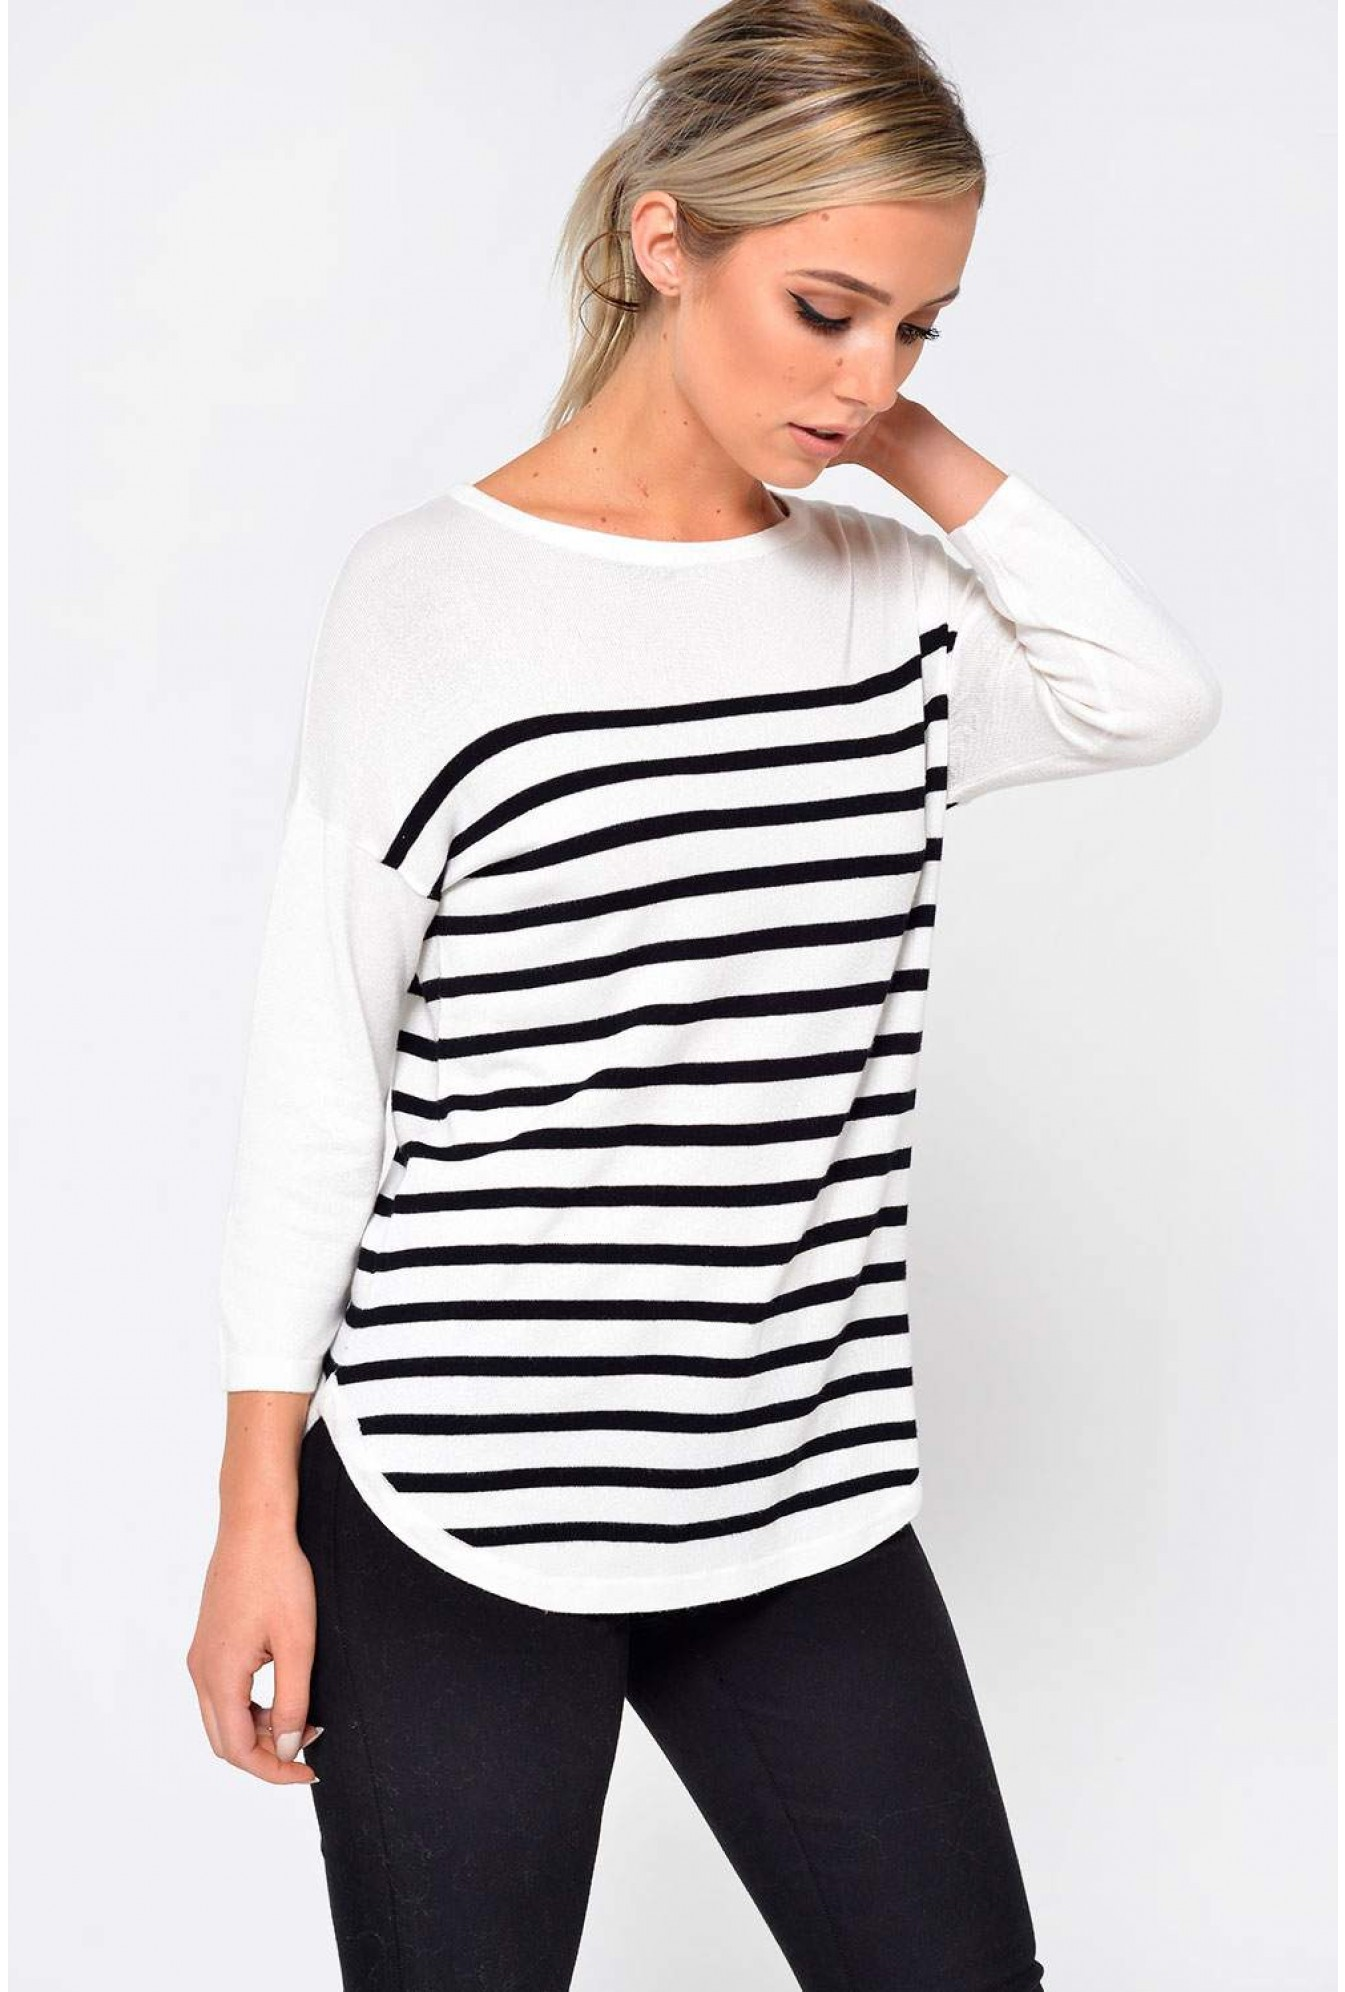 453645b9161 Jacqueline De Yong Crush 3 4 Sleeve Top in Black Stripe